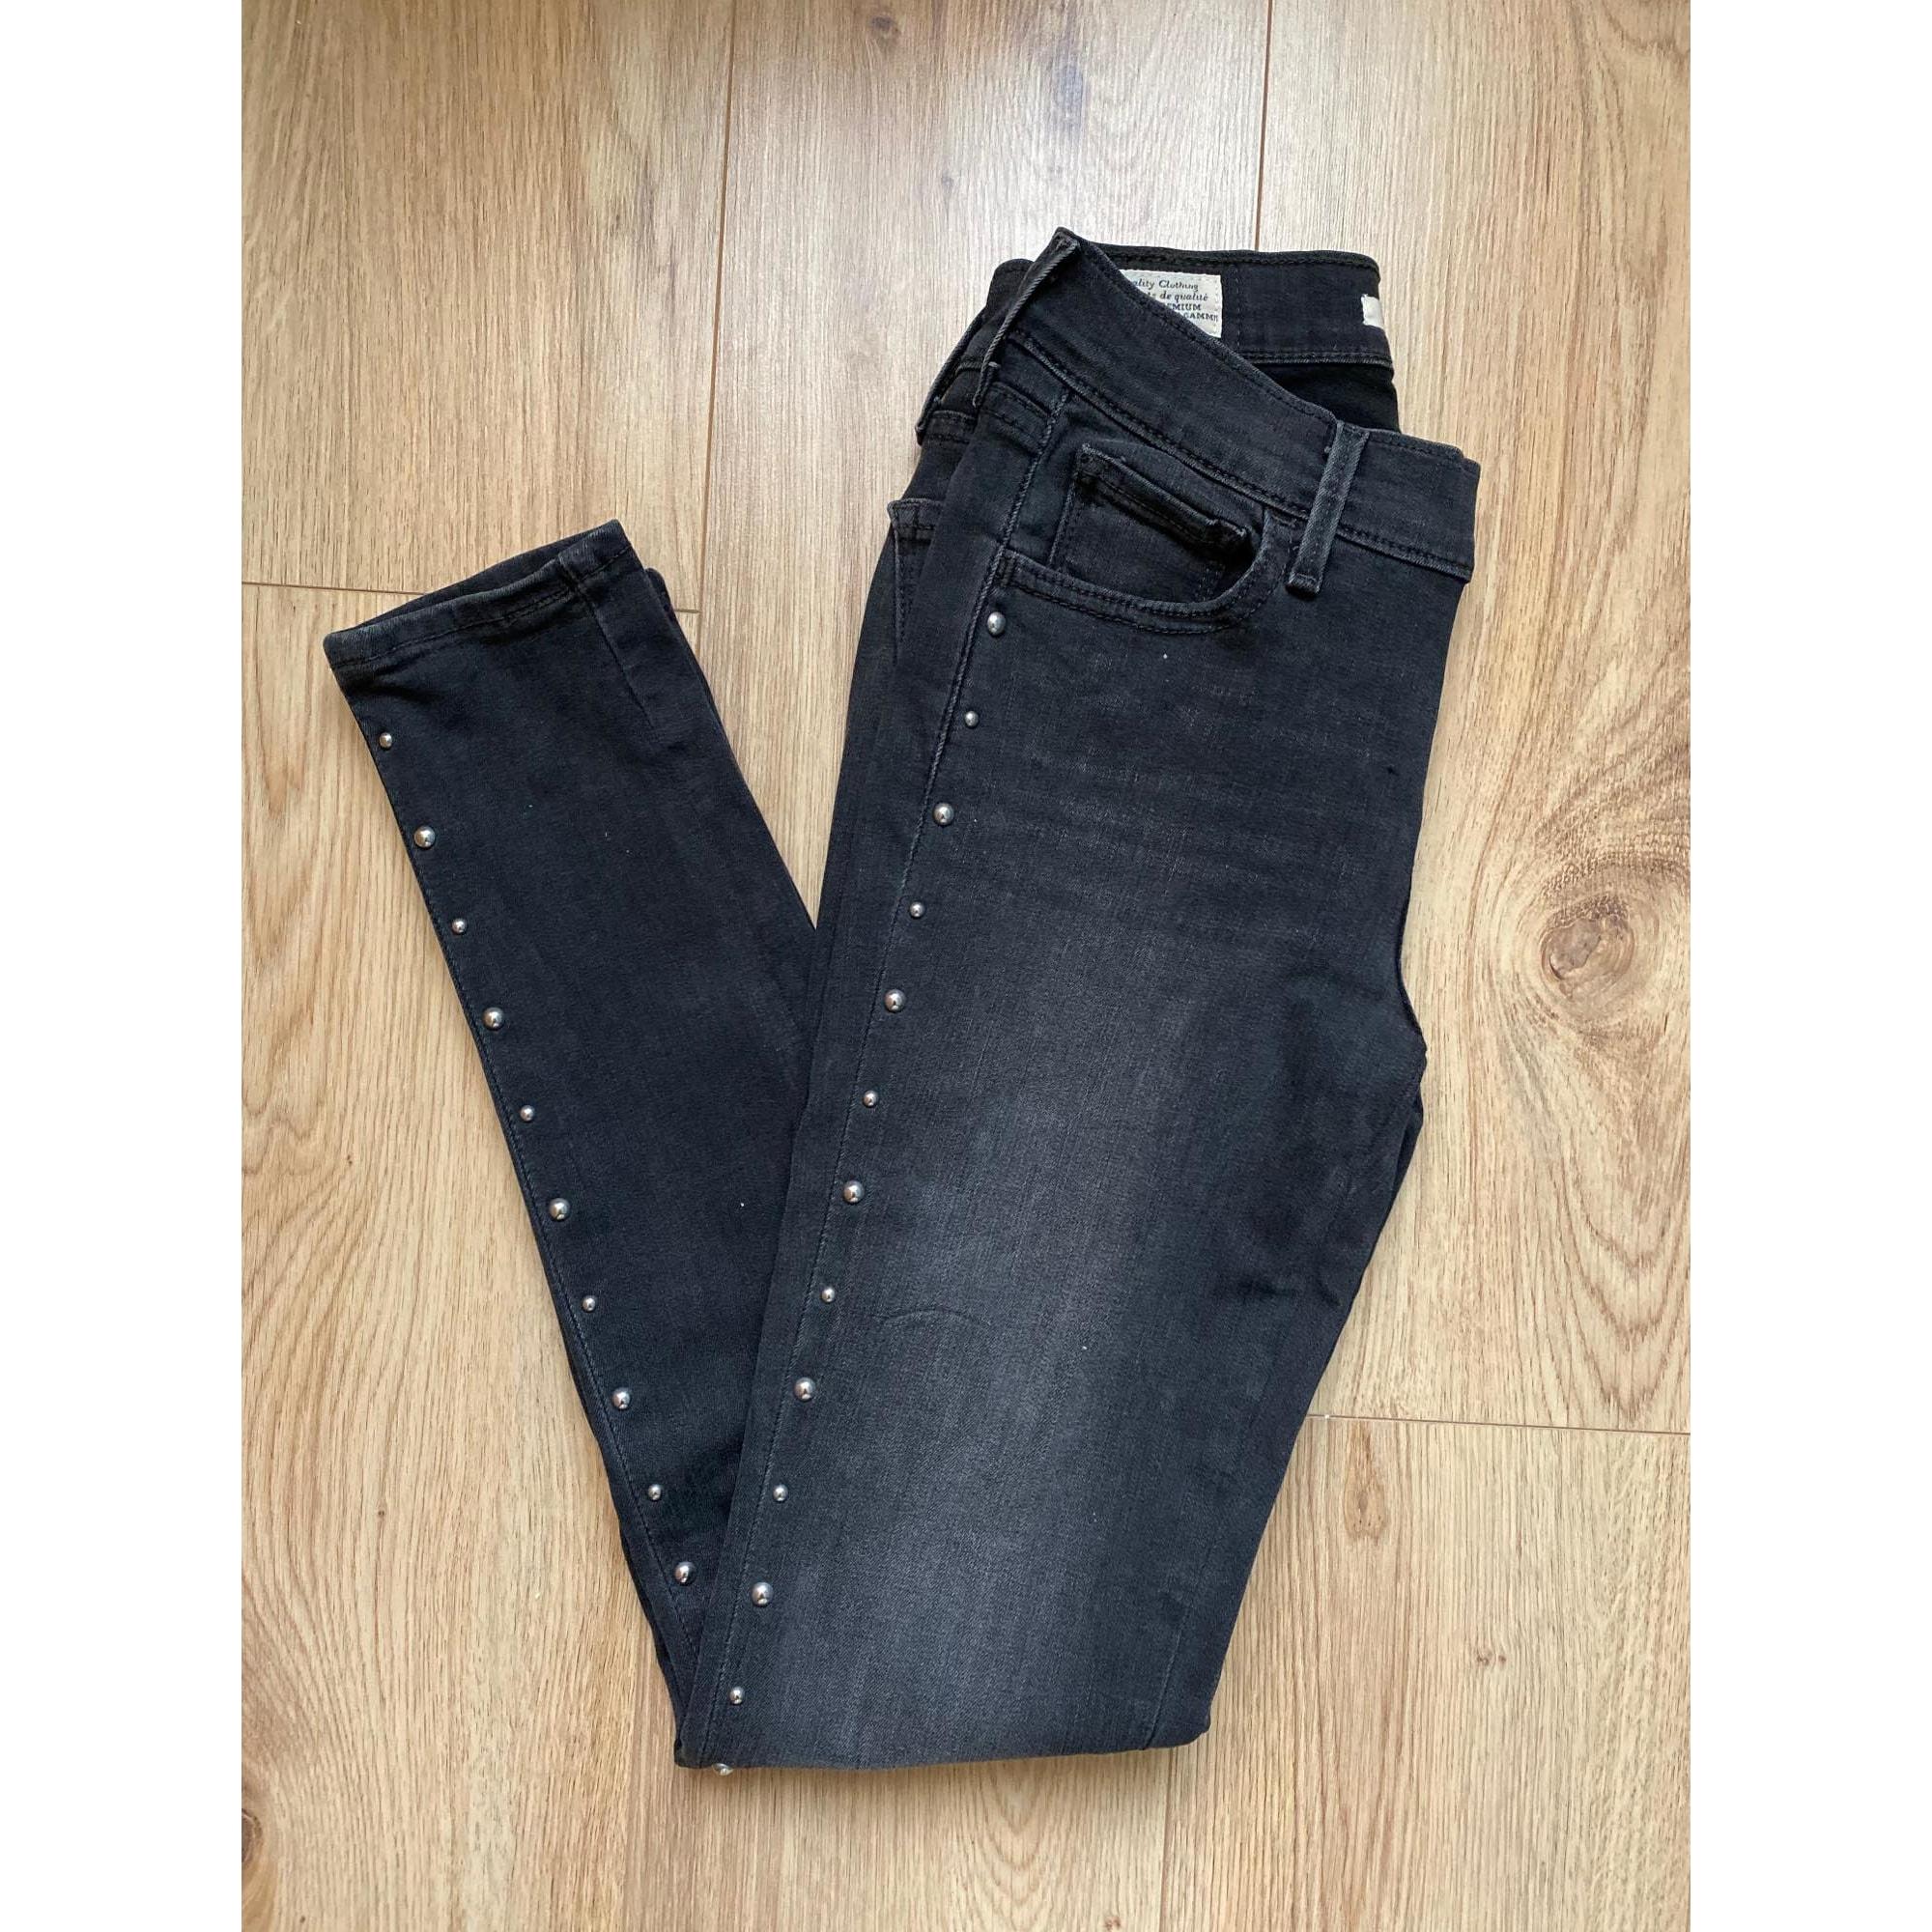 Jeans slim LEVI'S Gris, anthracite